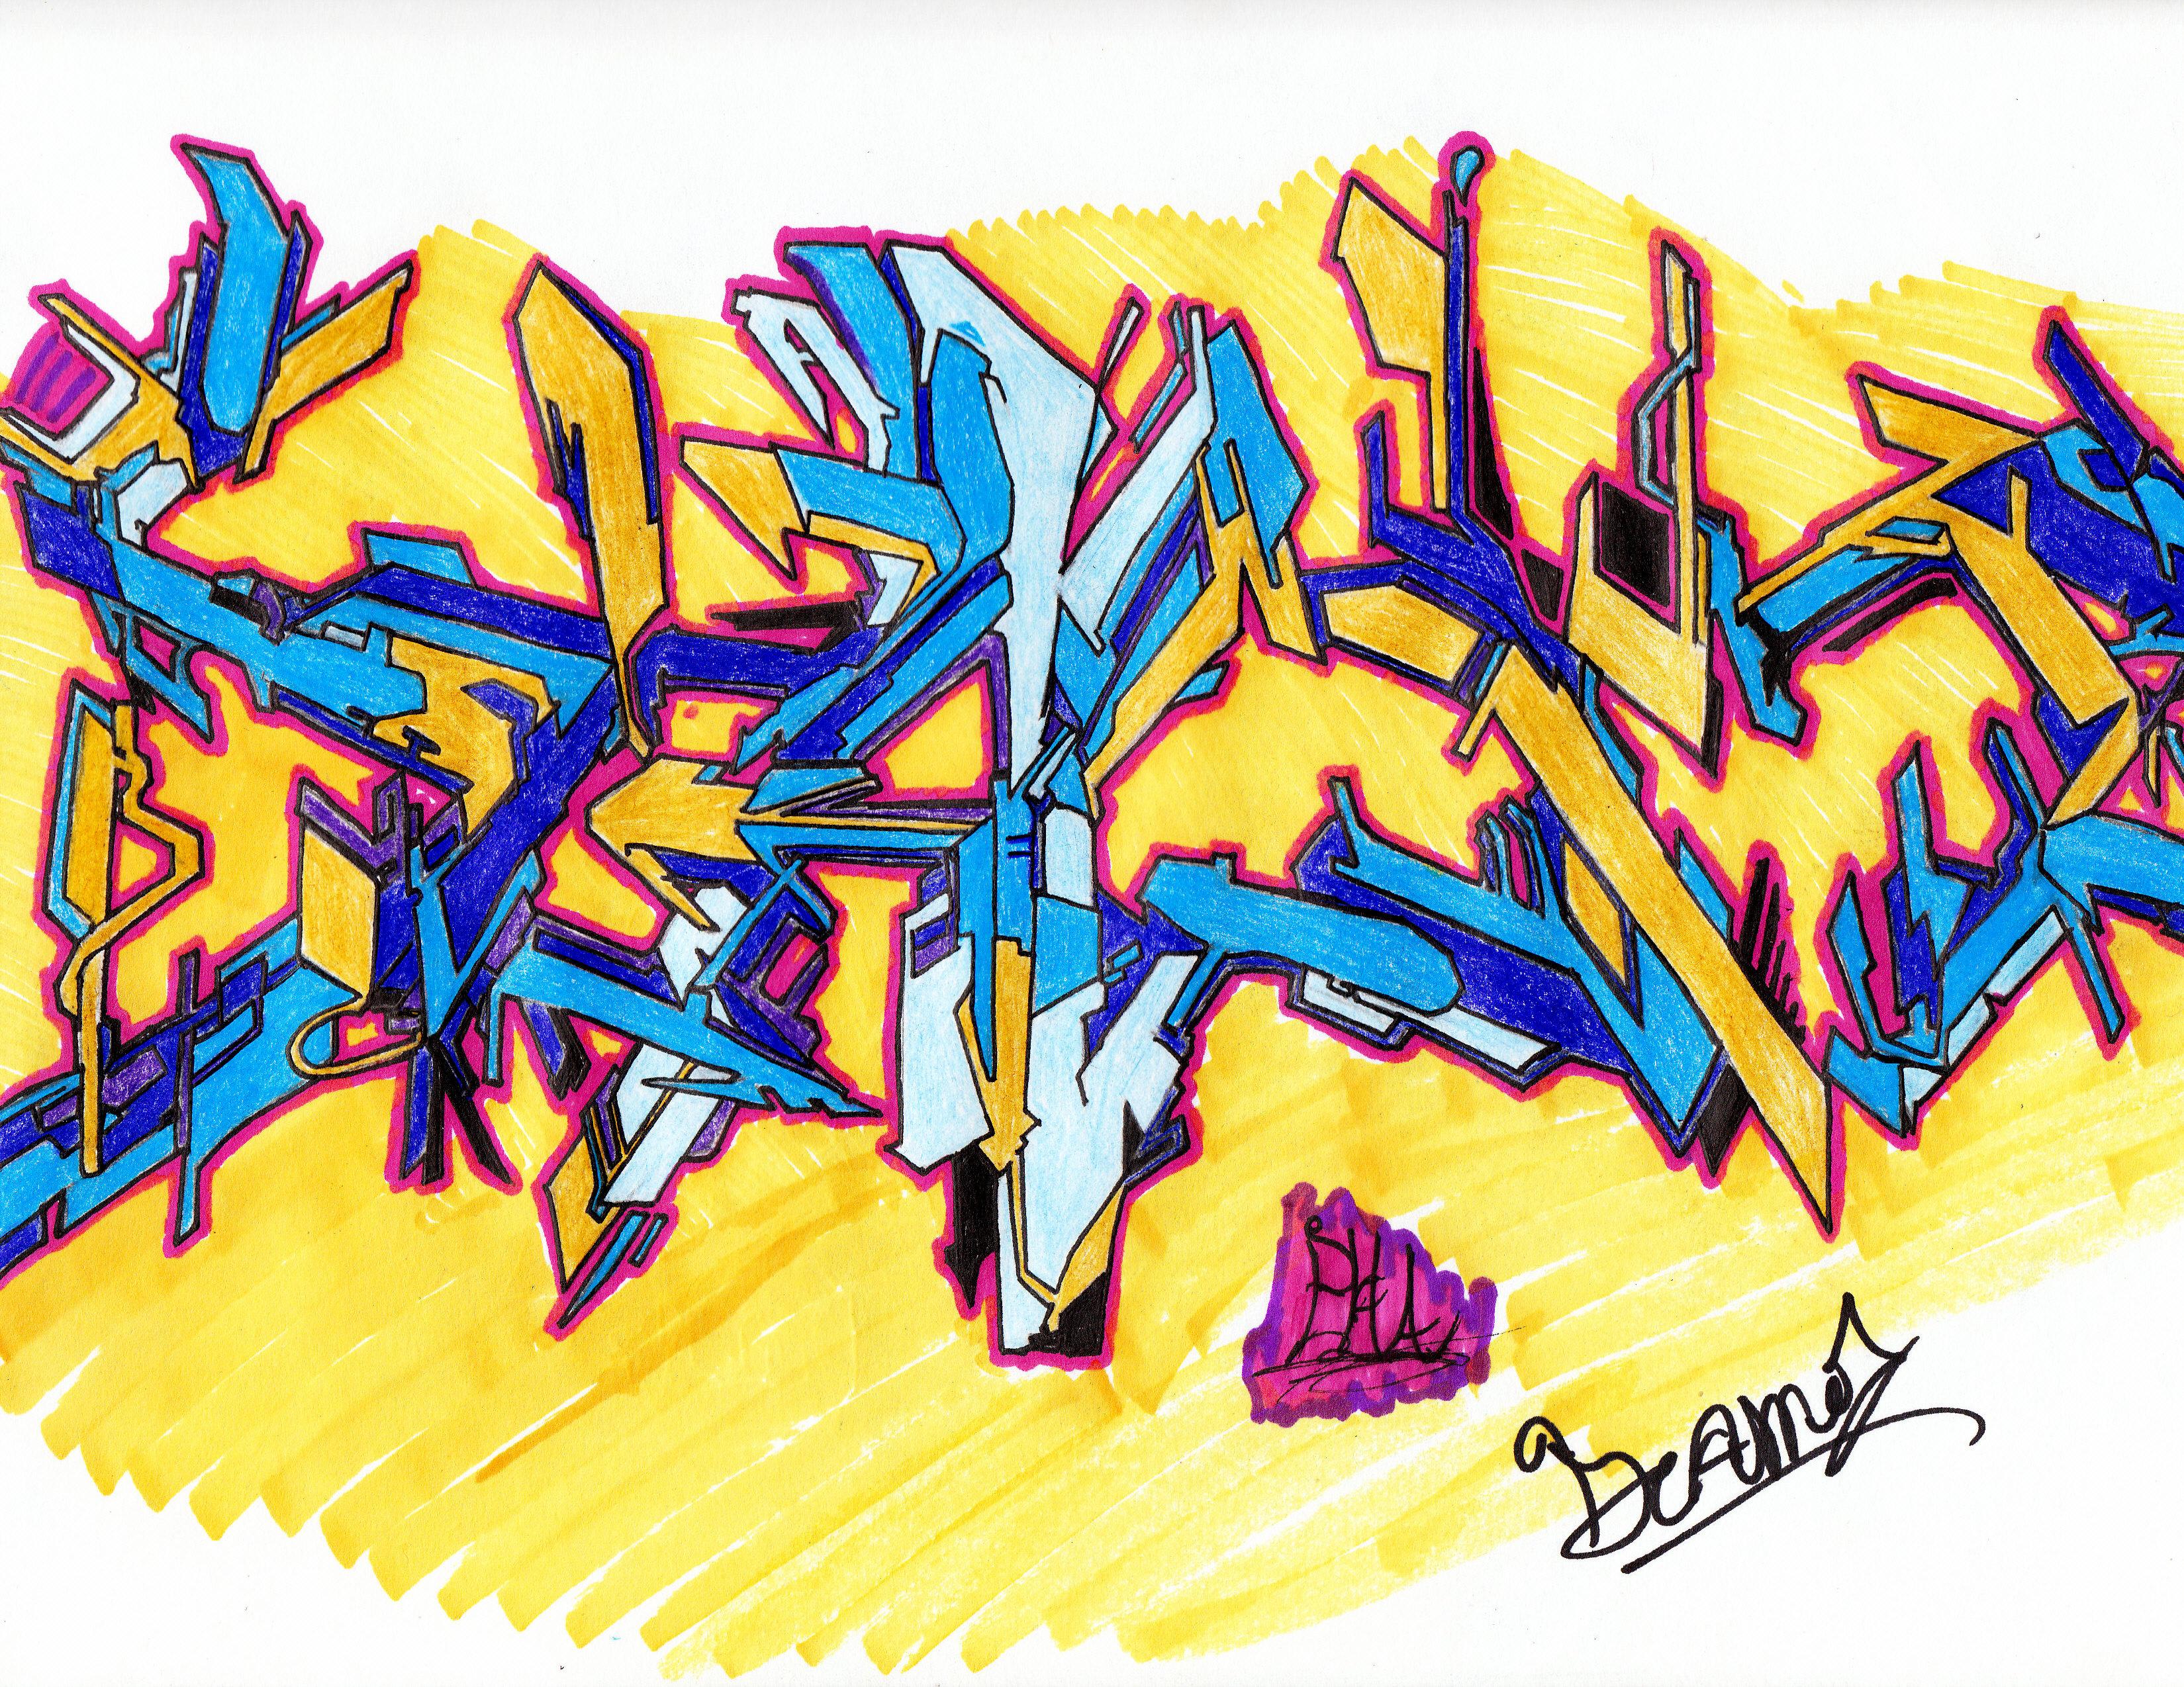 Wildstyle Graffiti Art...